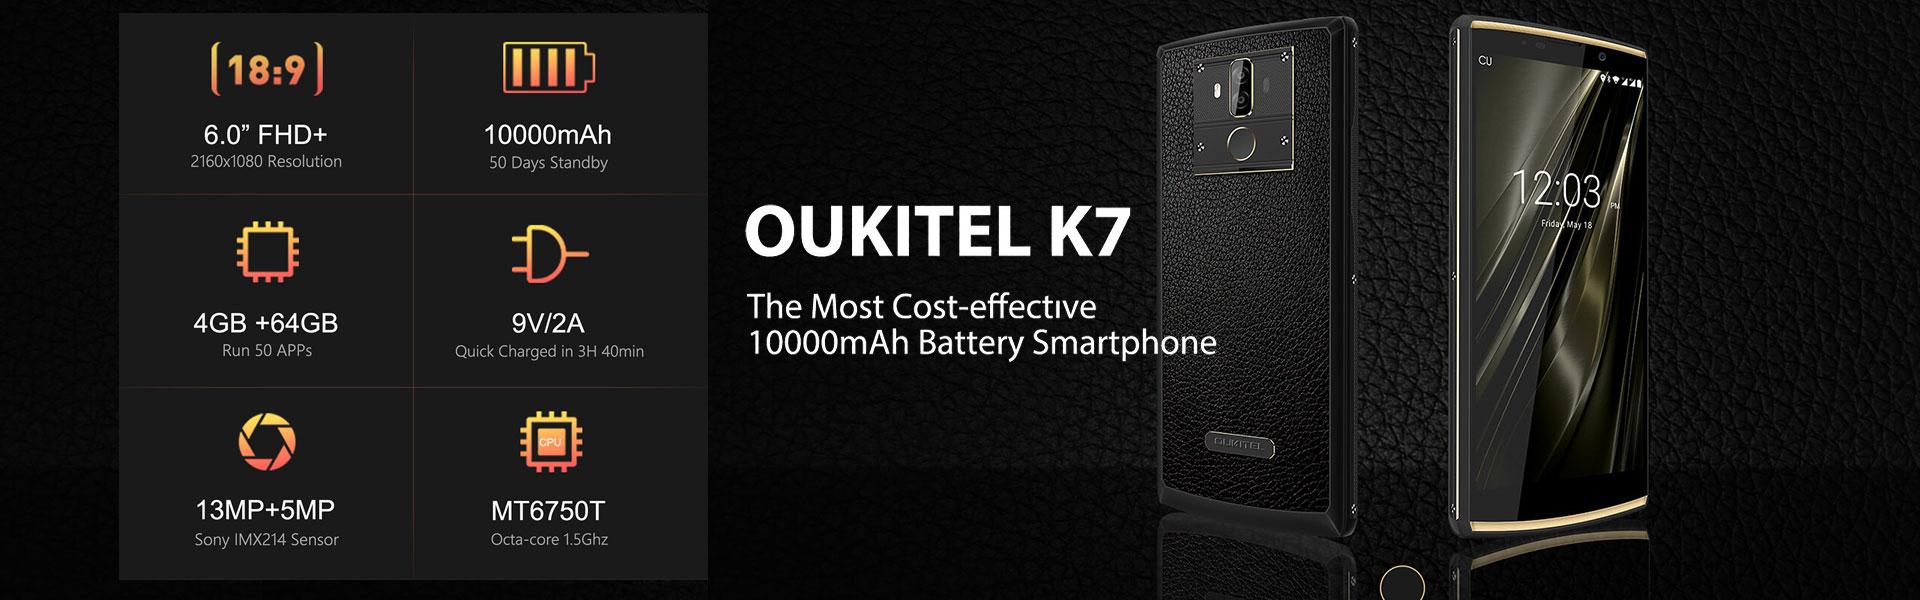 OUKITEL-K7-1